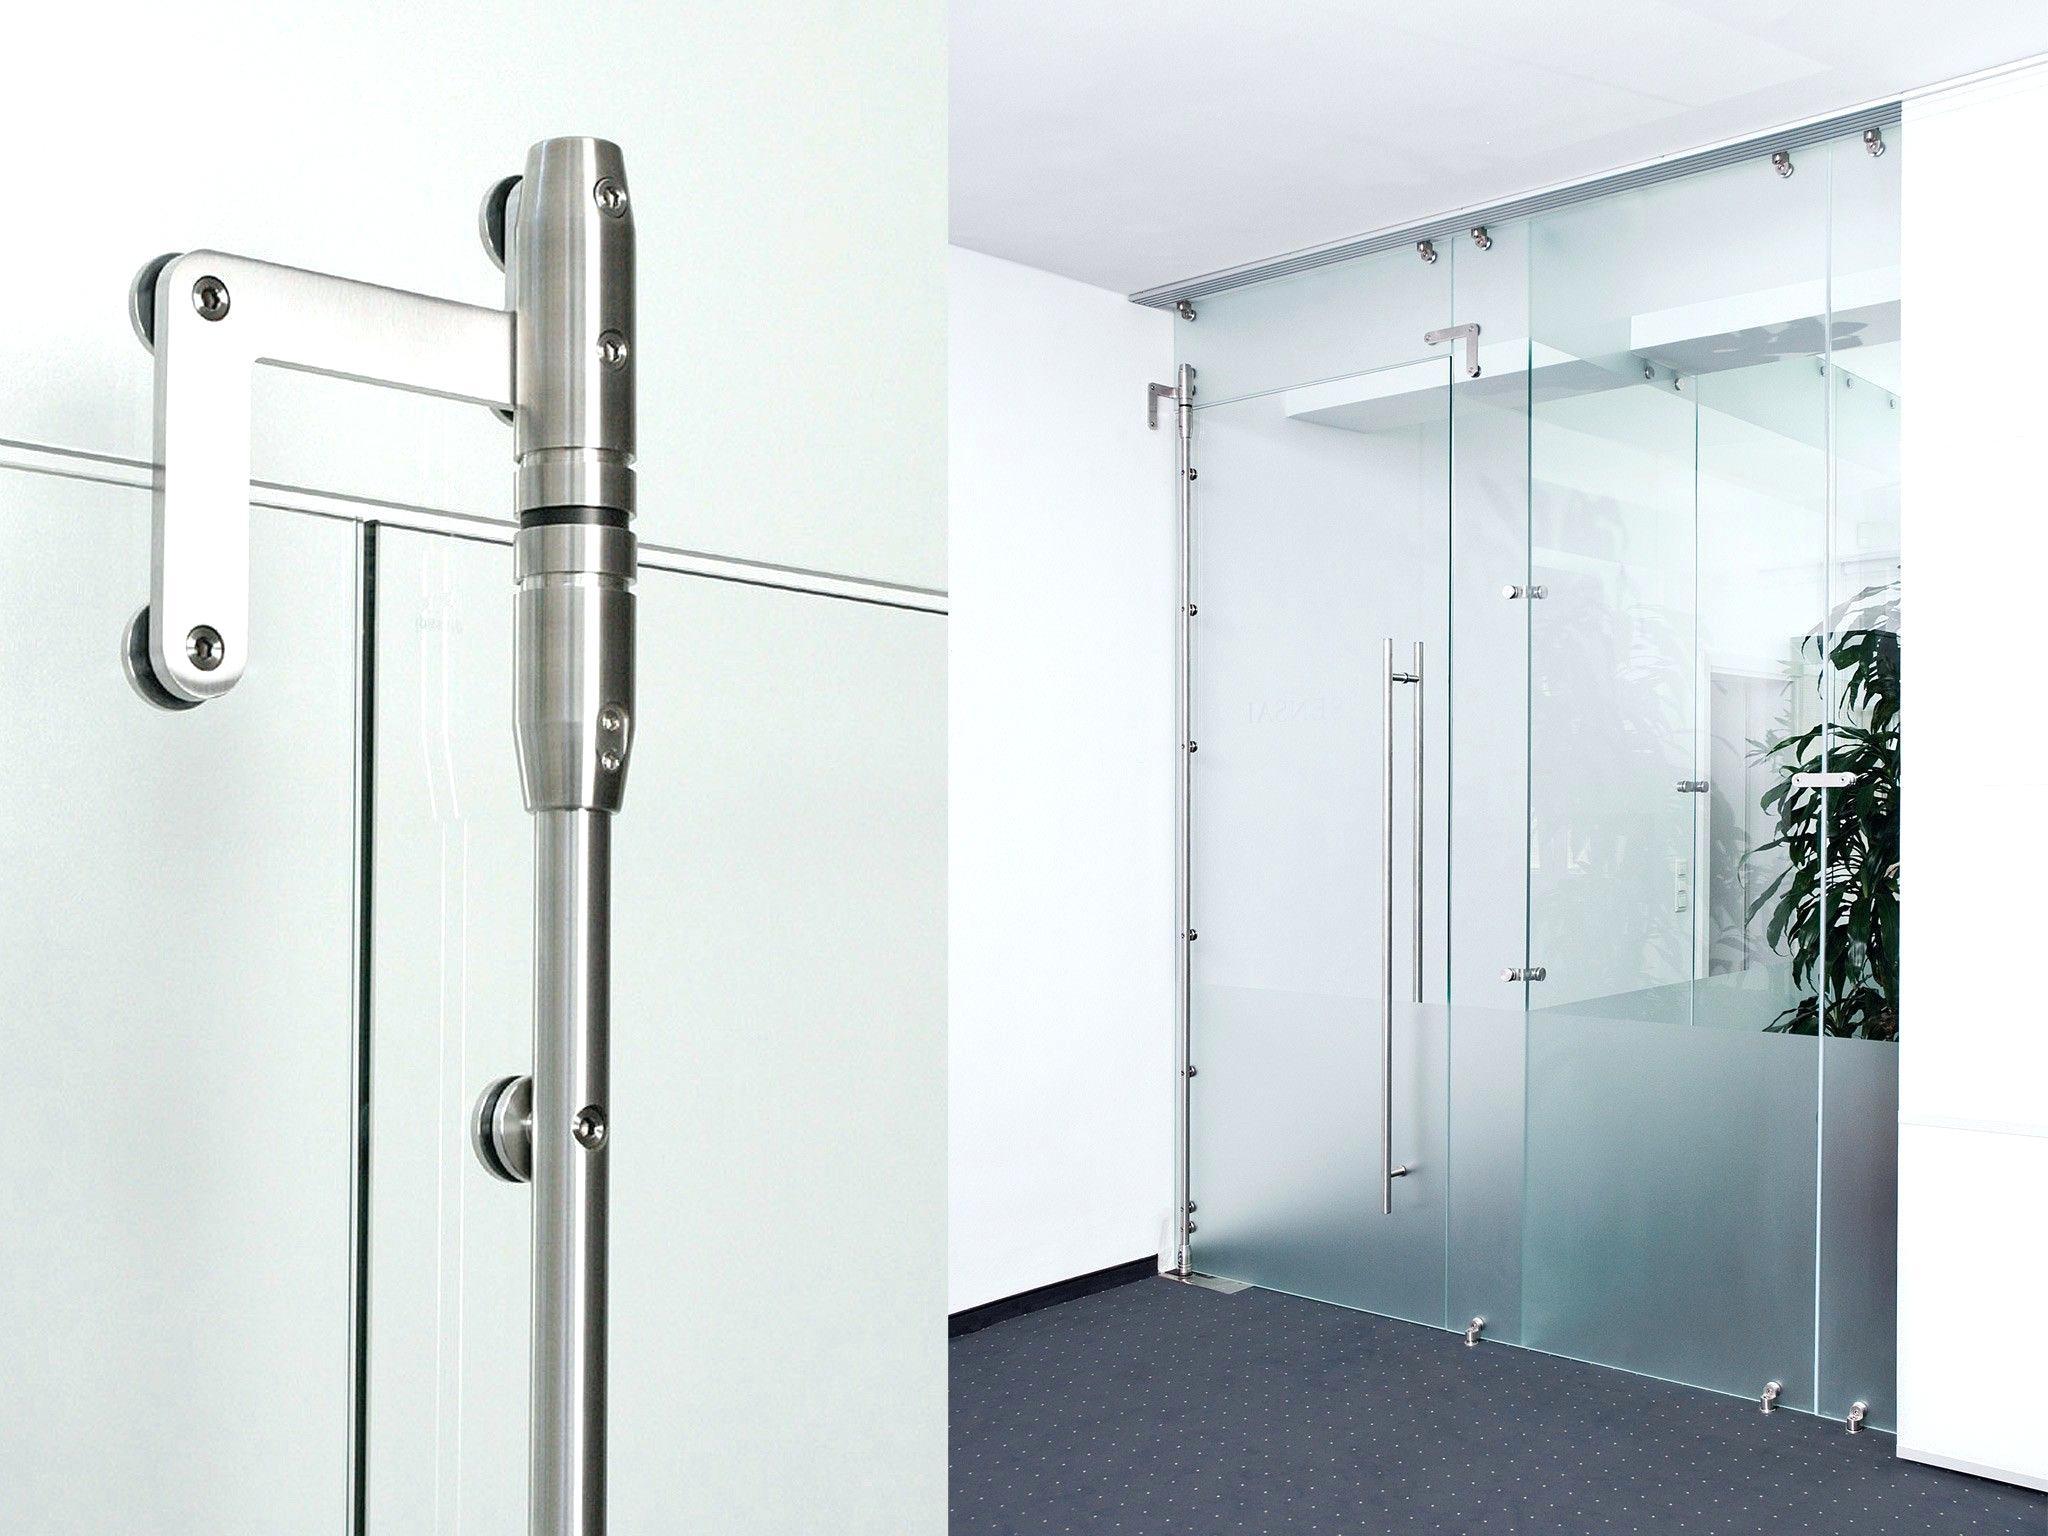 Electric Sliding Glass Door Lock2048 X 1536